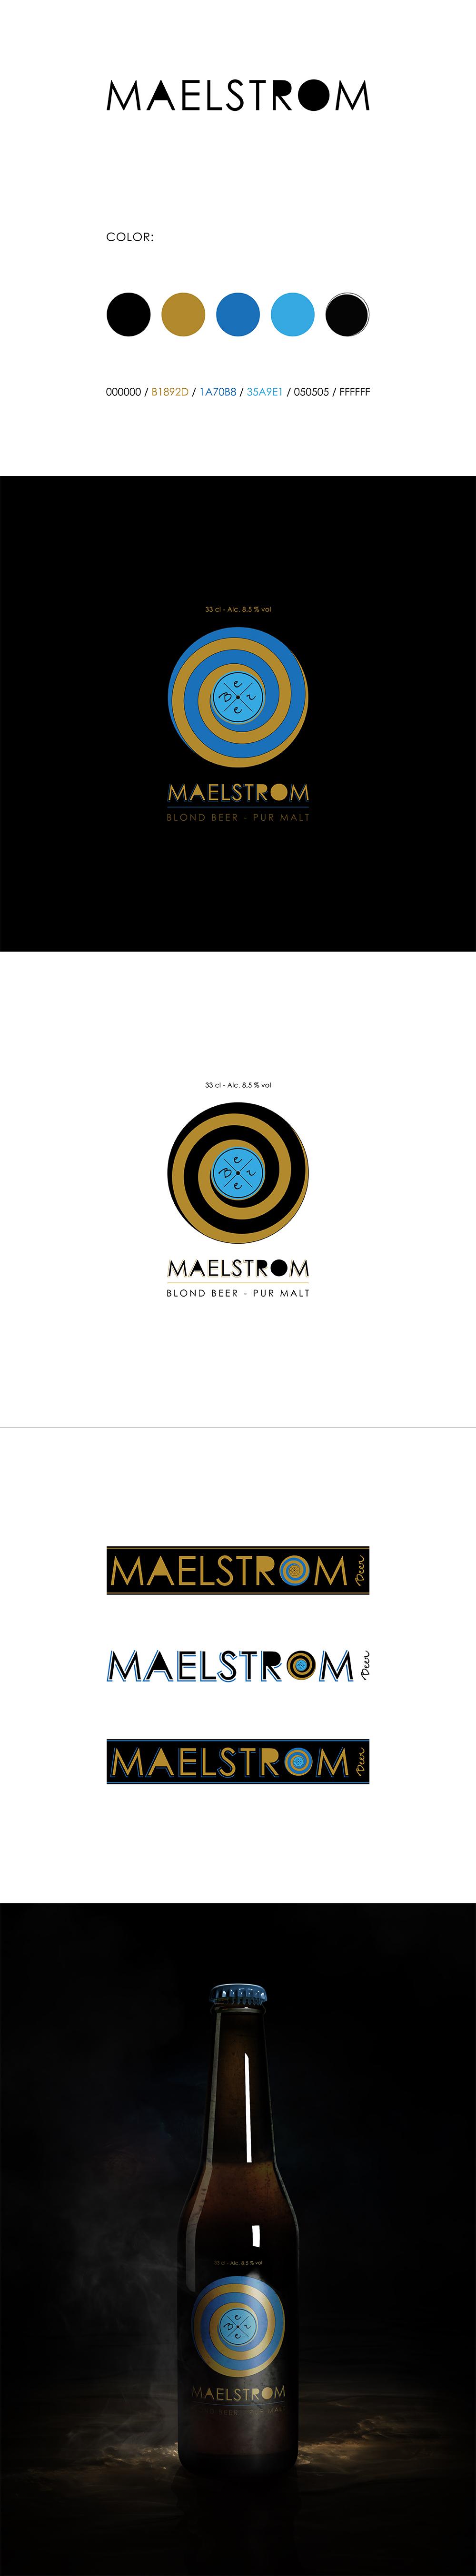 Maelstrom Beer